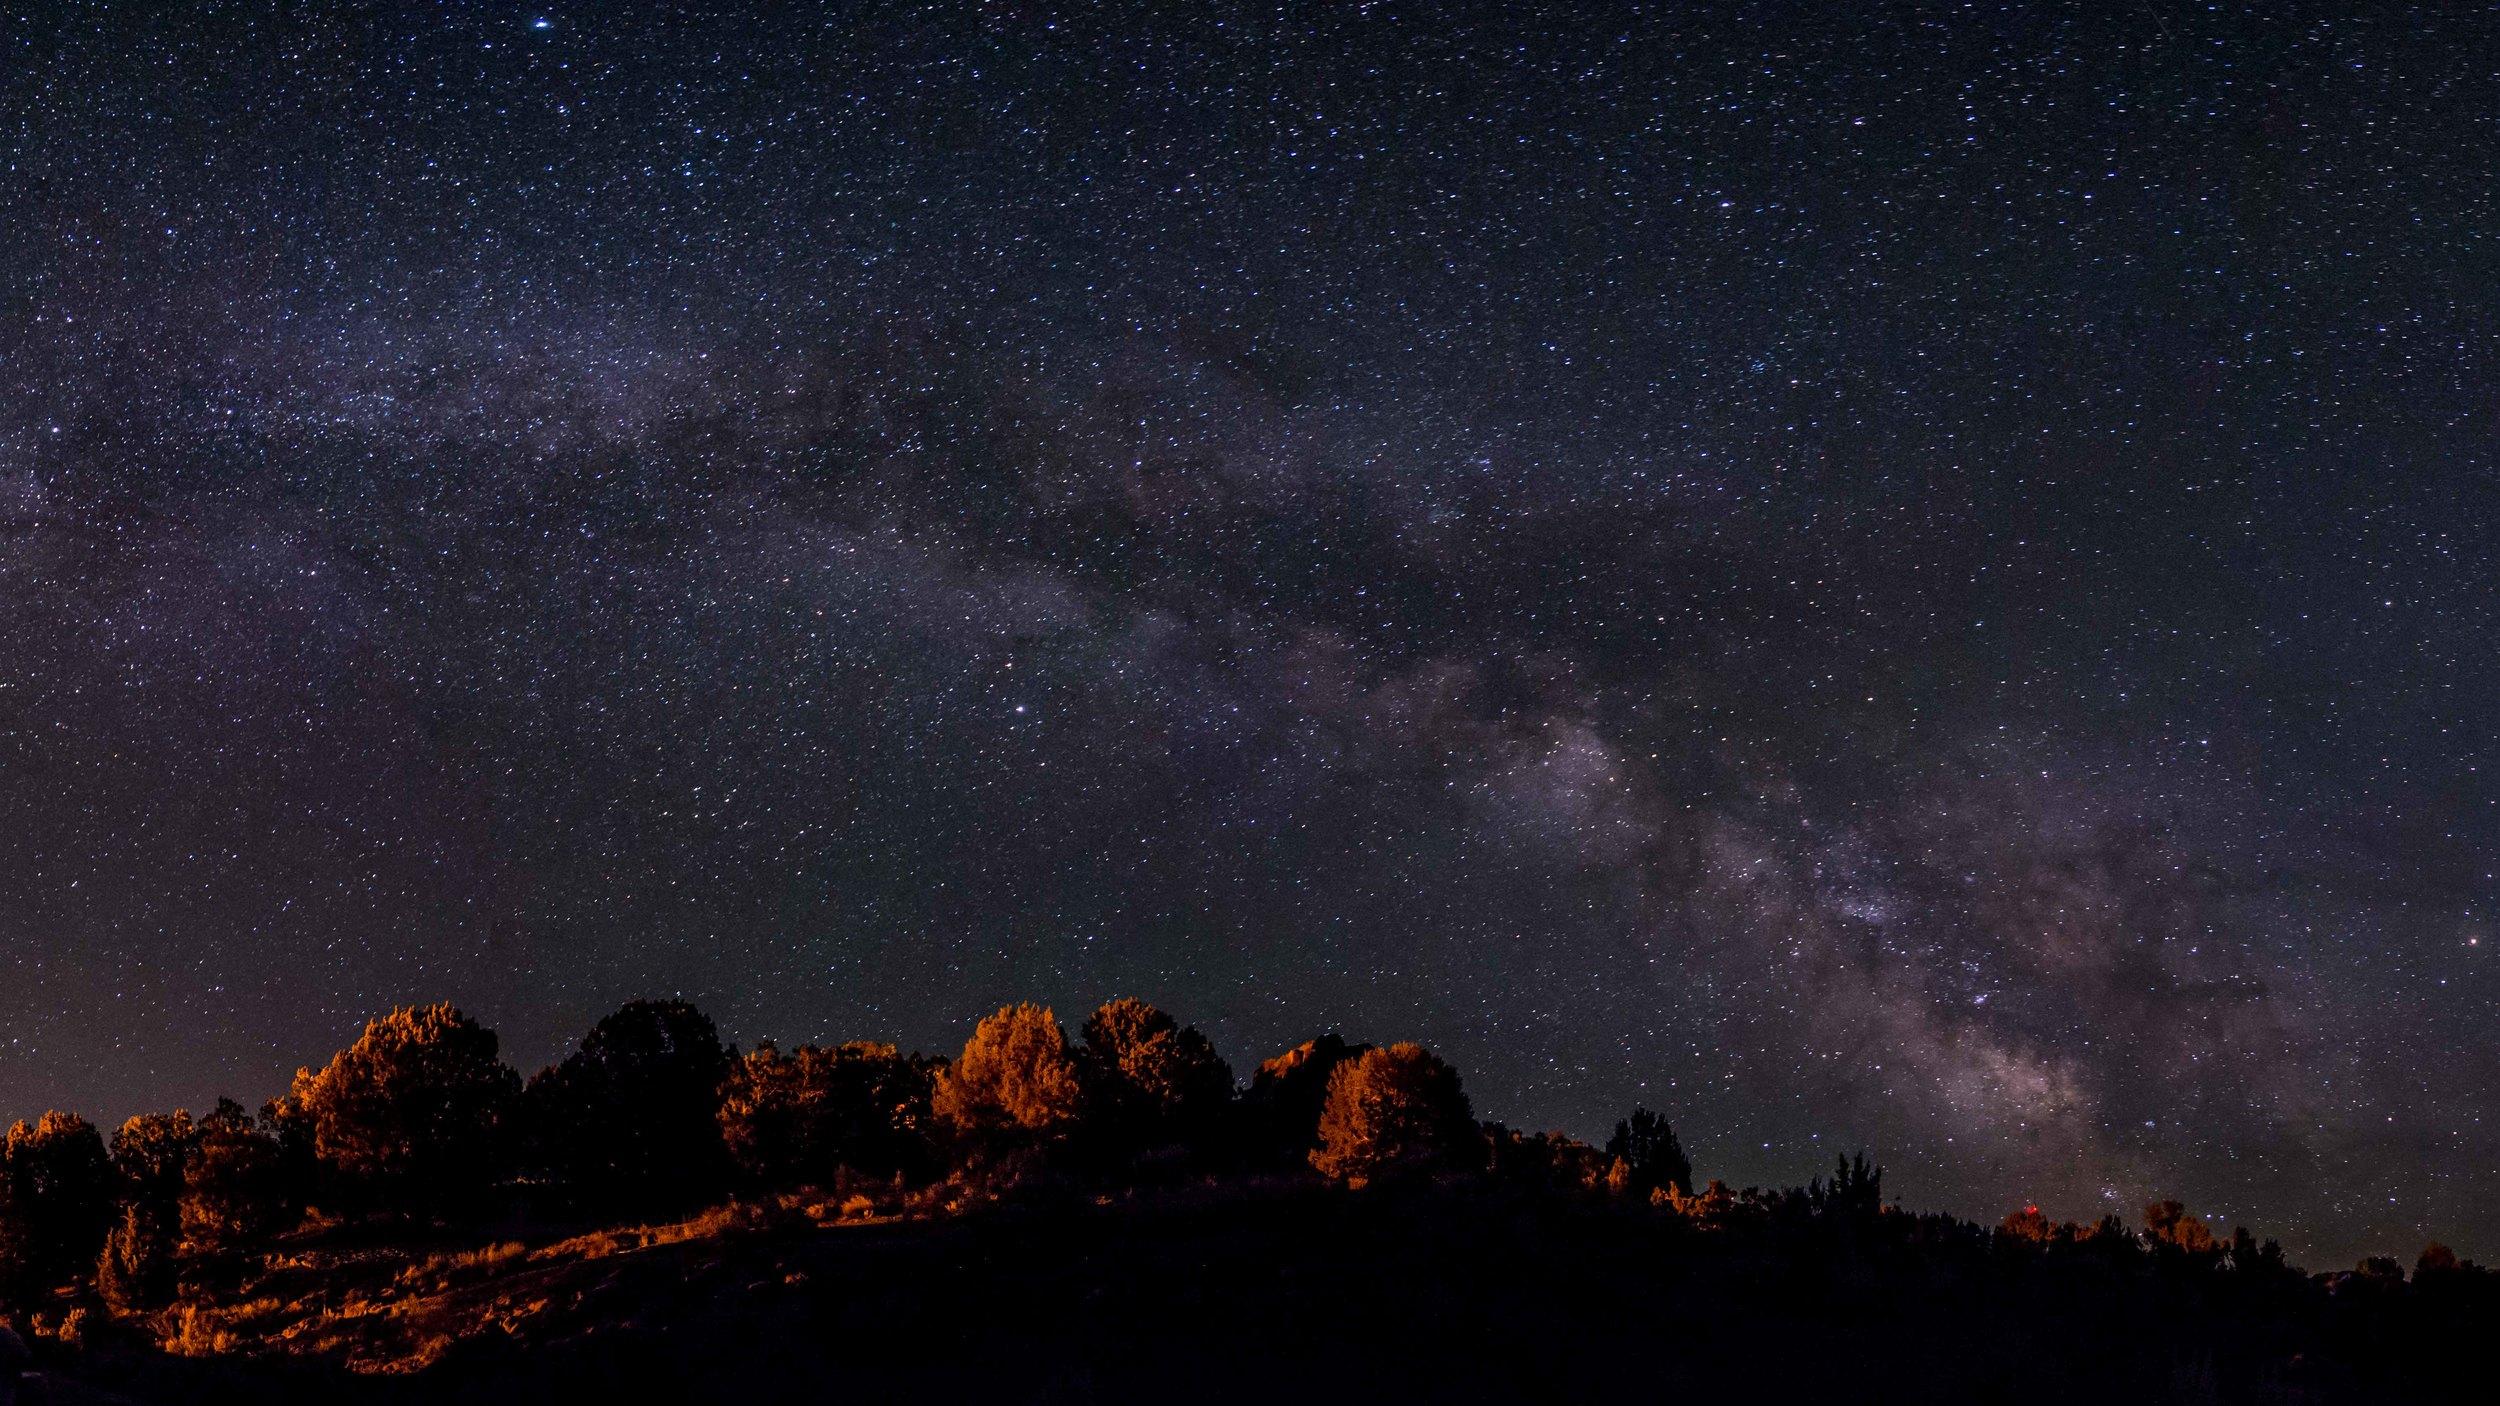 Milky Way at Massacre Rocks